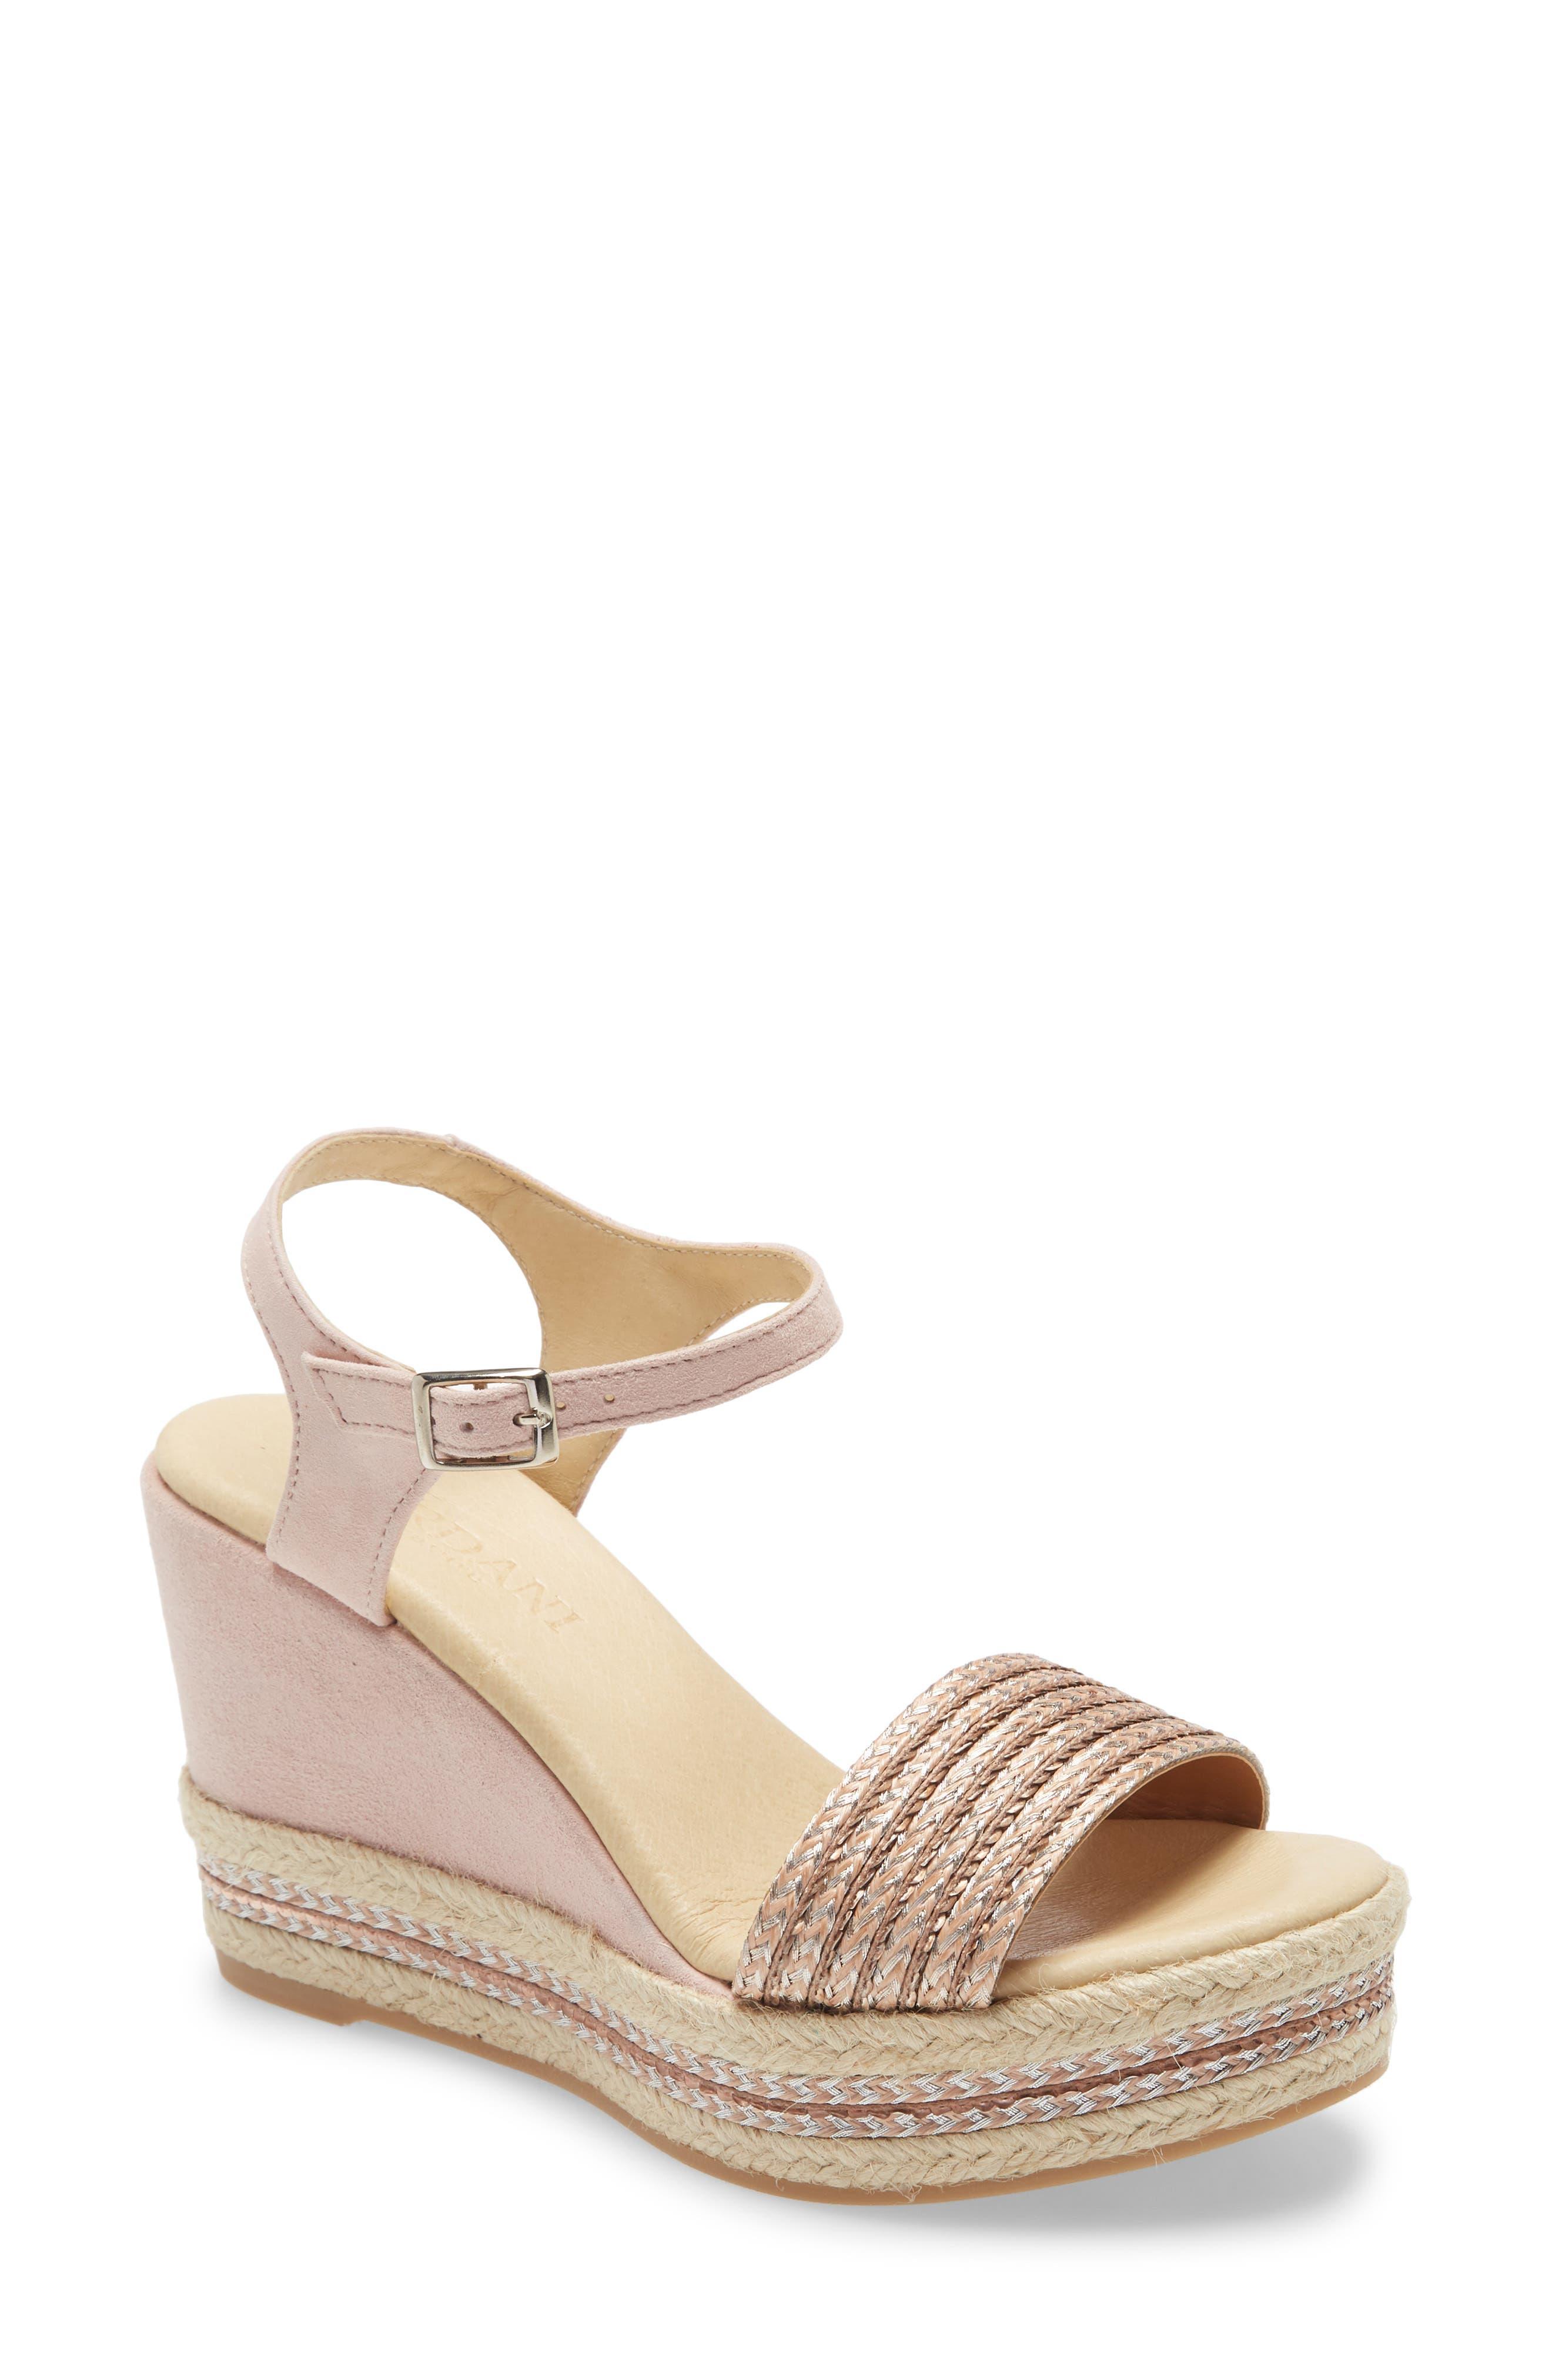 Evie Platform Wedge Sandal